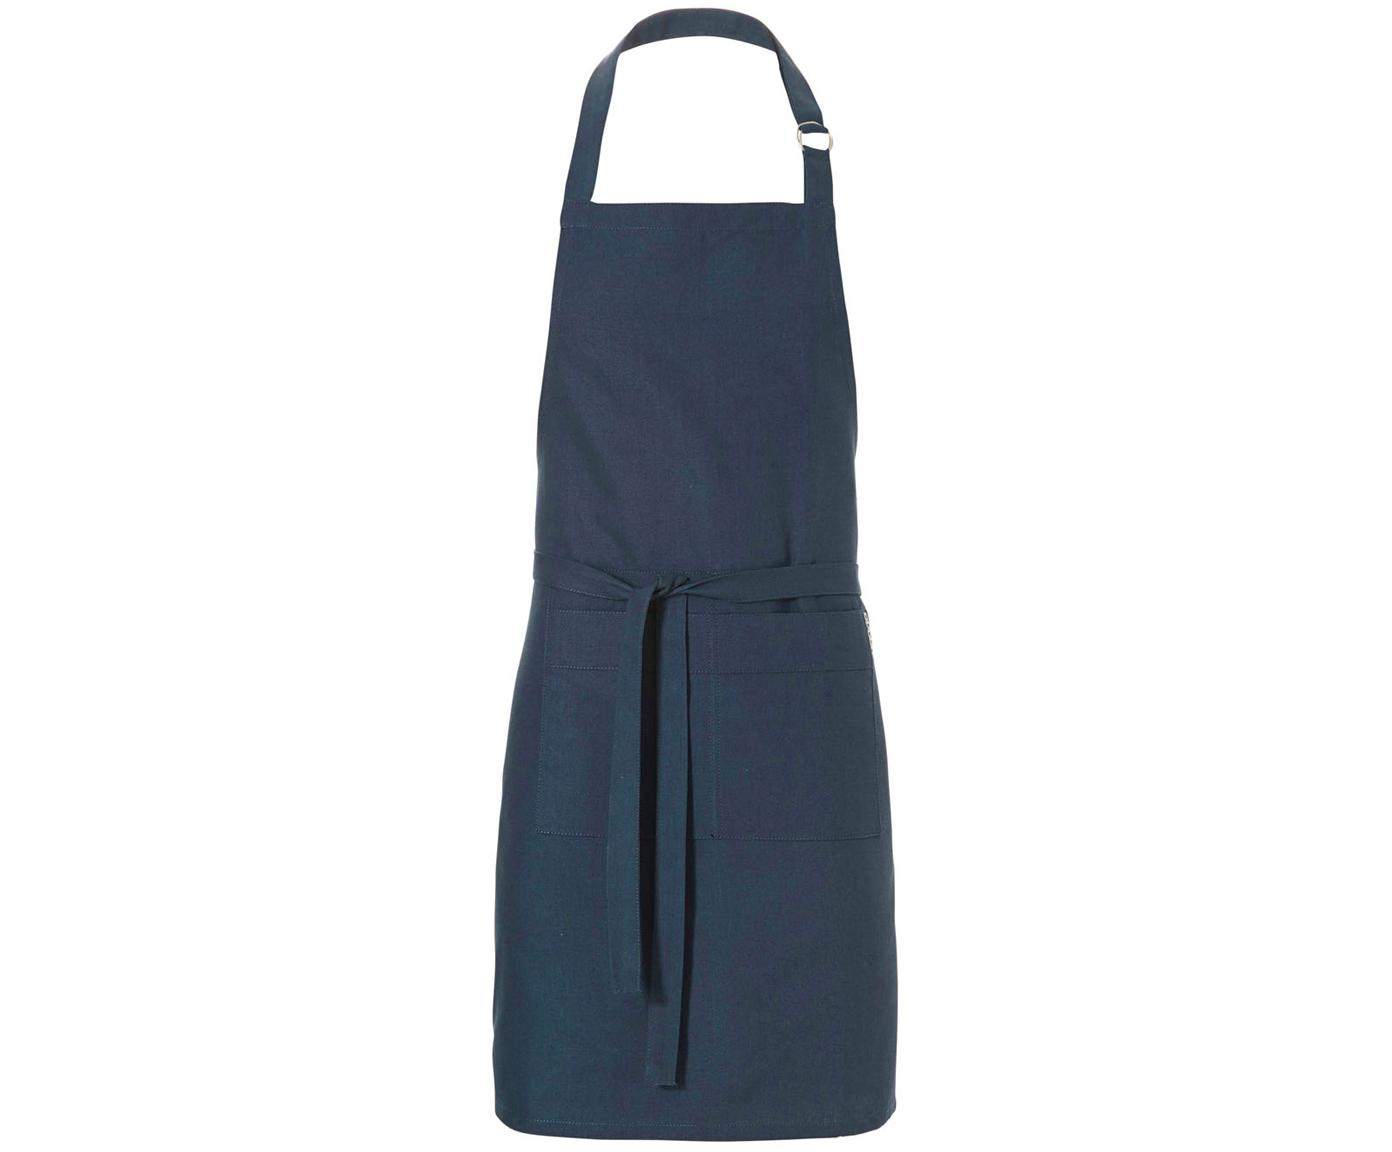 Delantal Kit, Algodón, Azul marino, An 85 x L 85 cm